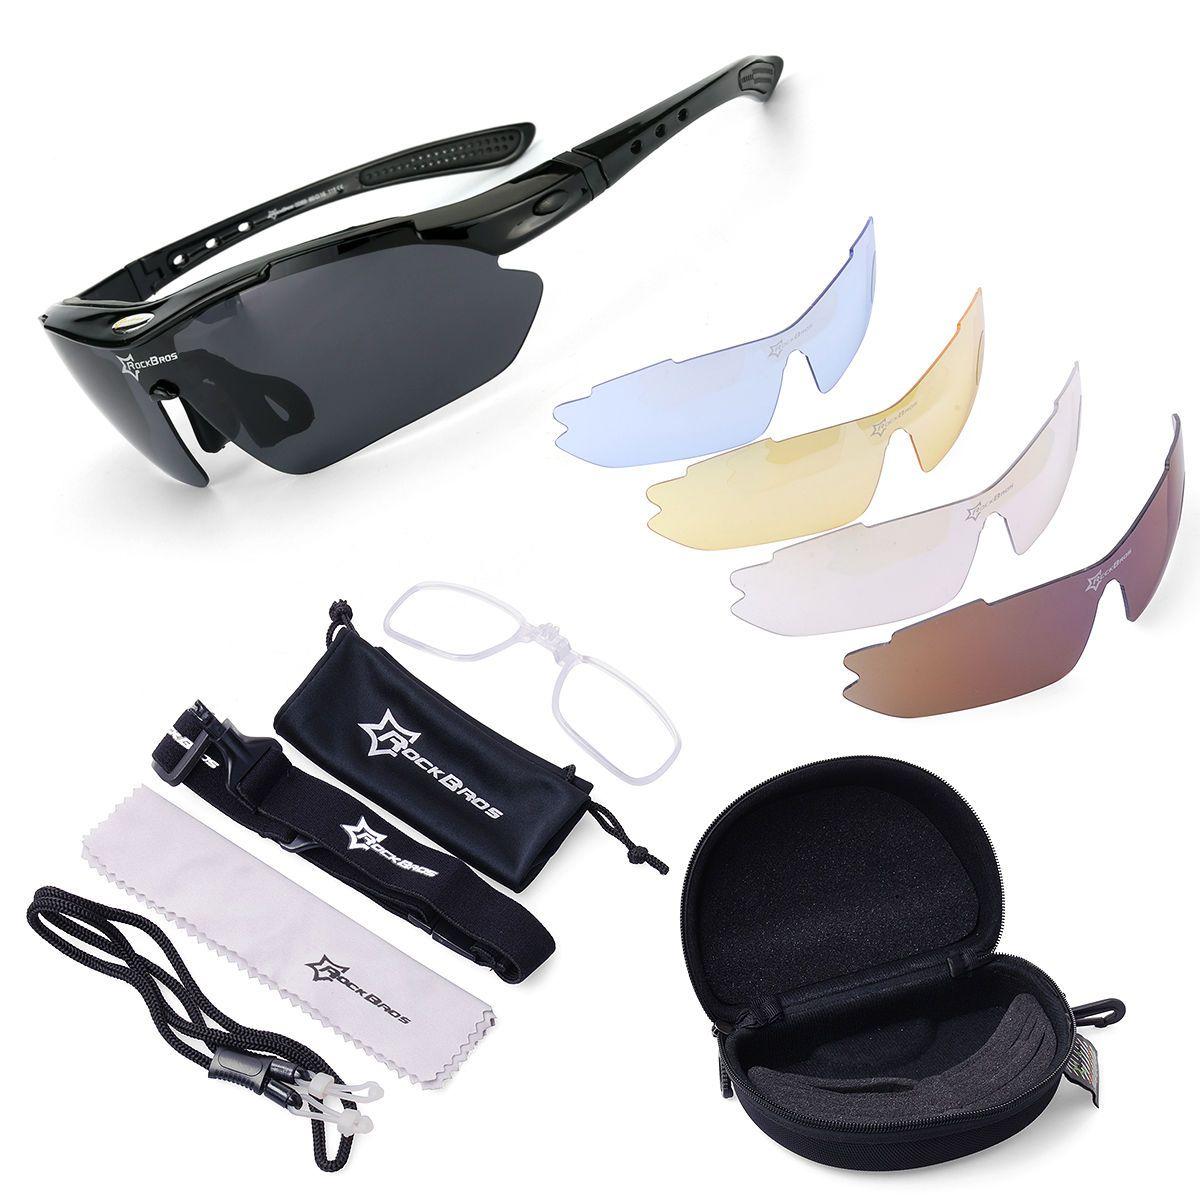 b76f17c5aba Rockbros Polarized Cycling Sunglasses Sports Glasses Bike Goggles Uv400  Unisex